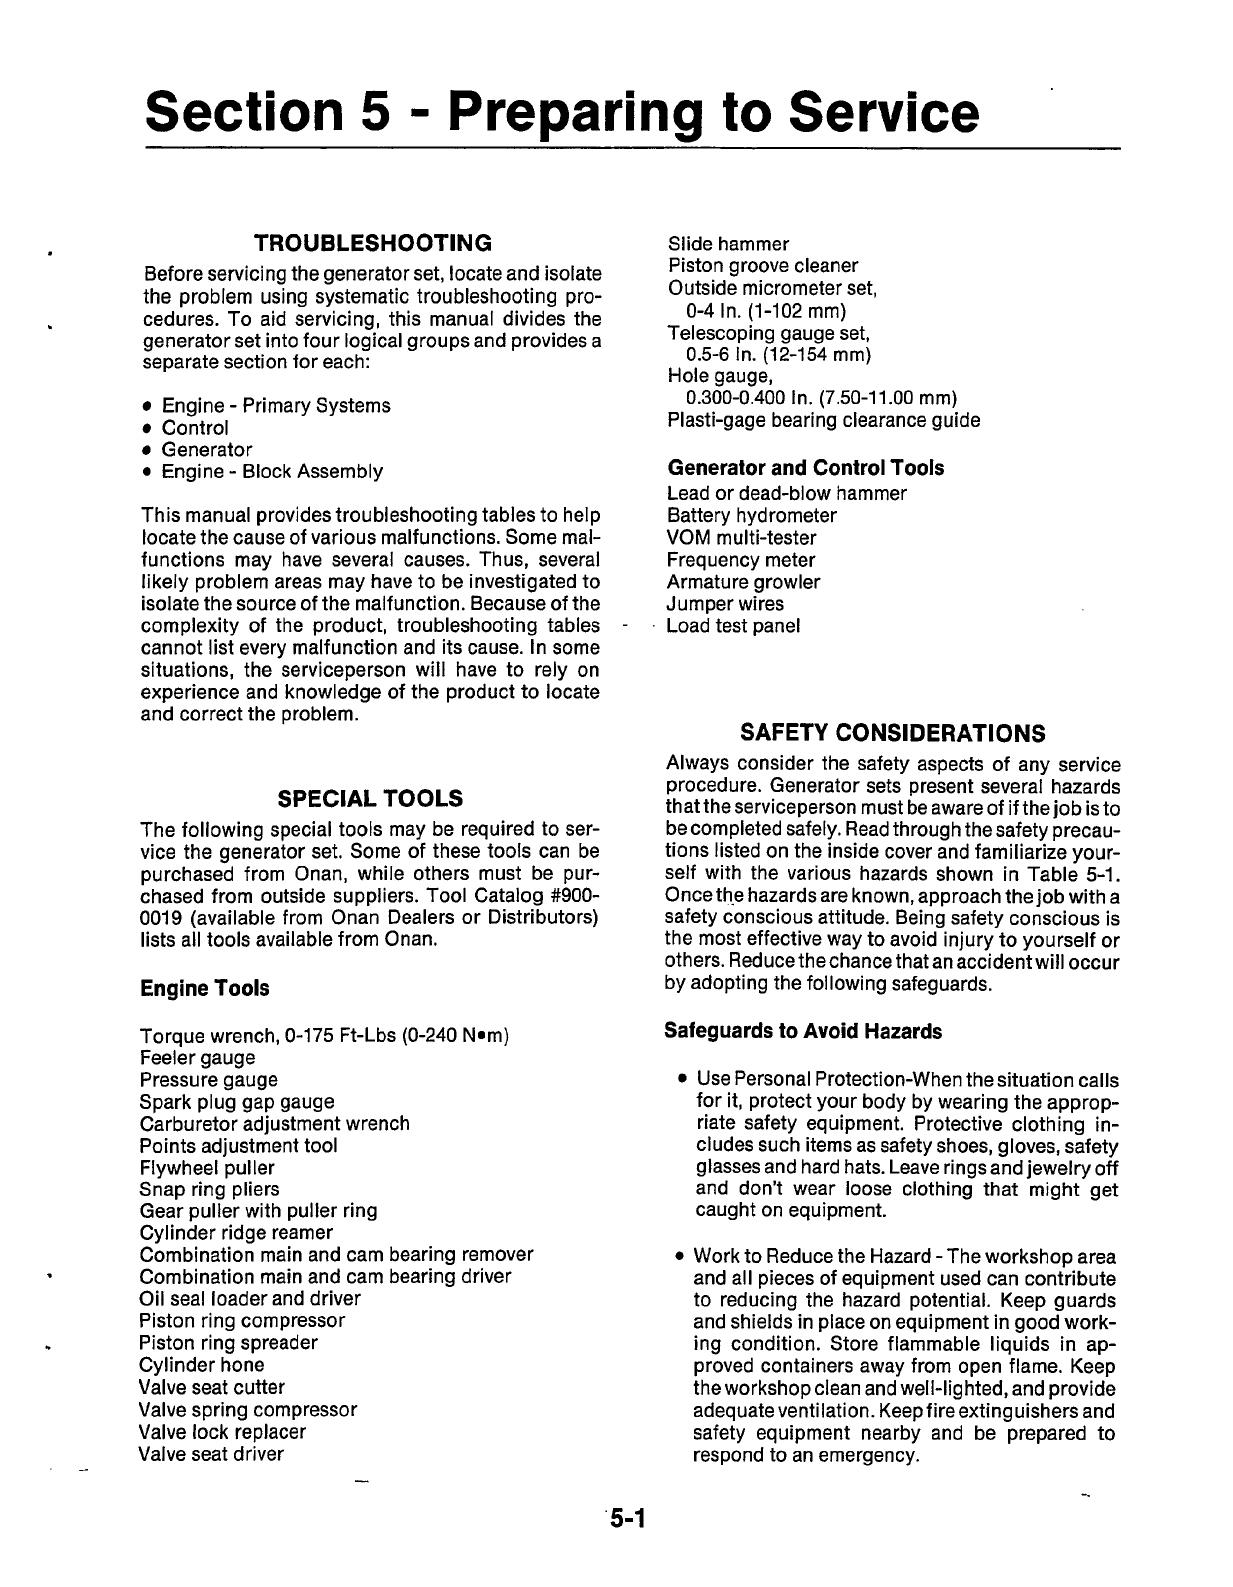 940 0502 Onan NHE NHEL (spec A C) RV Genset Service Manual (07 1987)